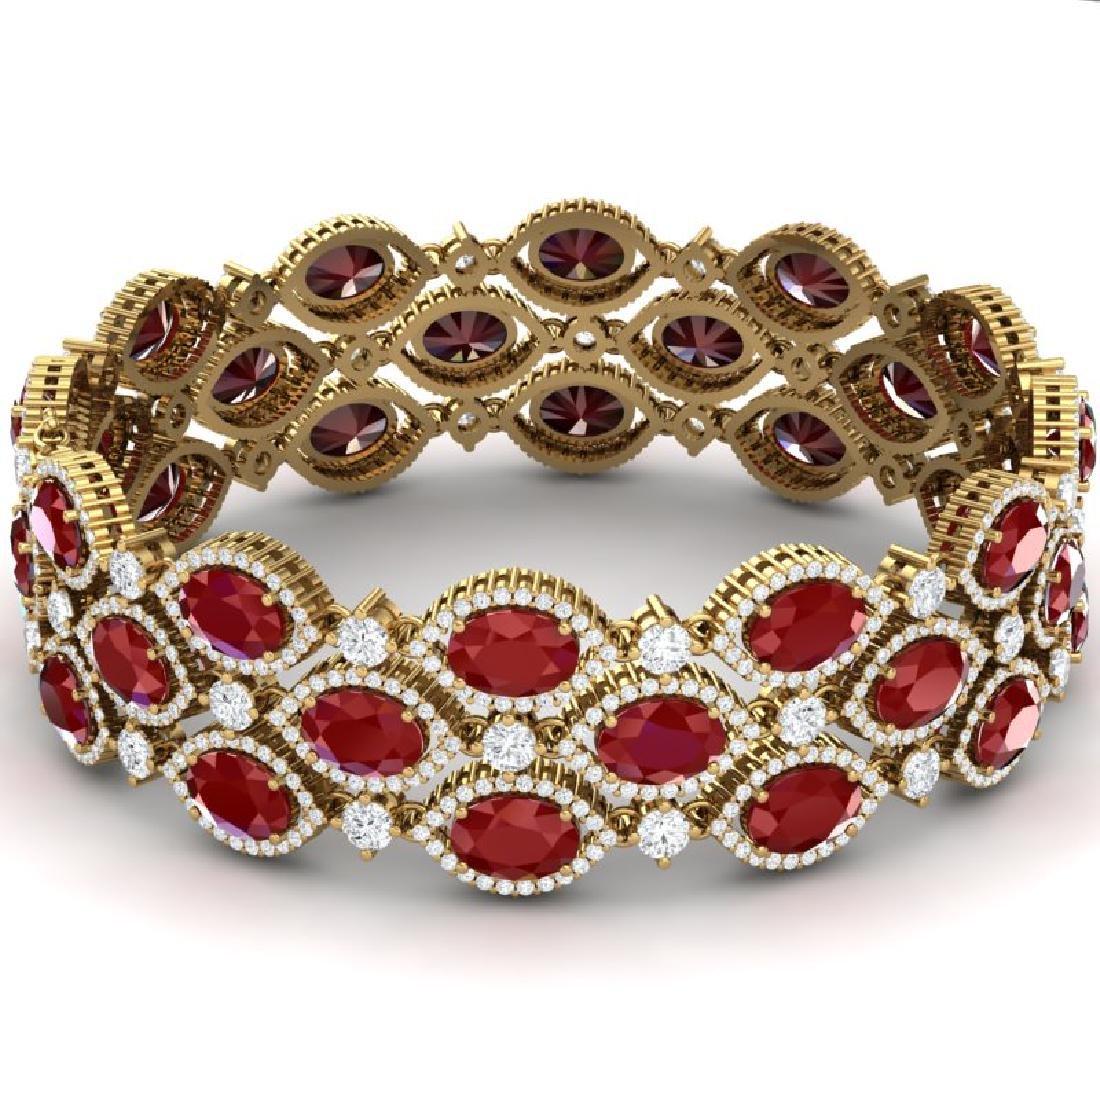 47.84 CTW Royalty Ruby & VS Diamond Bracelet 18K Yellow - 3